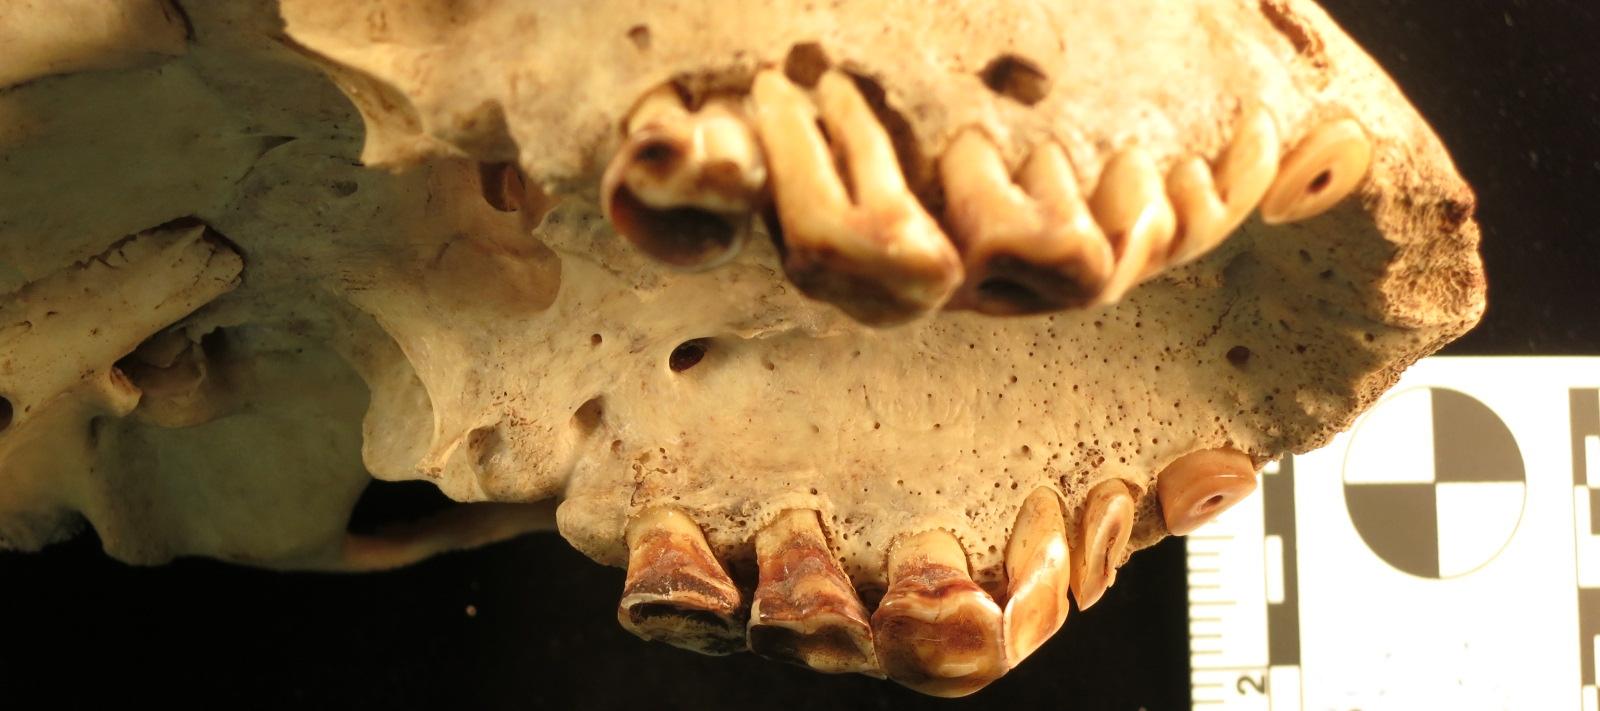 chimpanzee maxilla